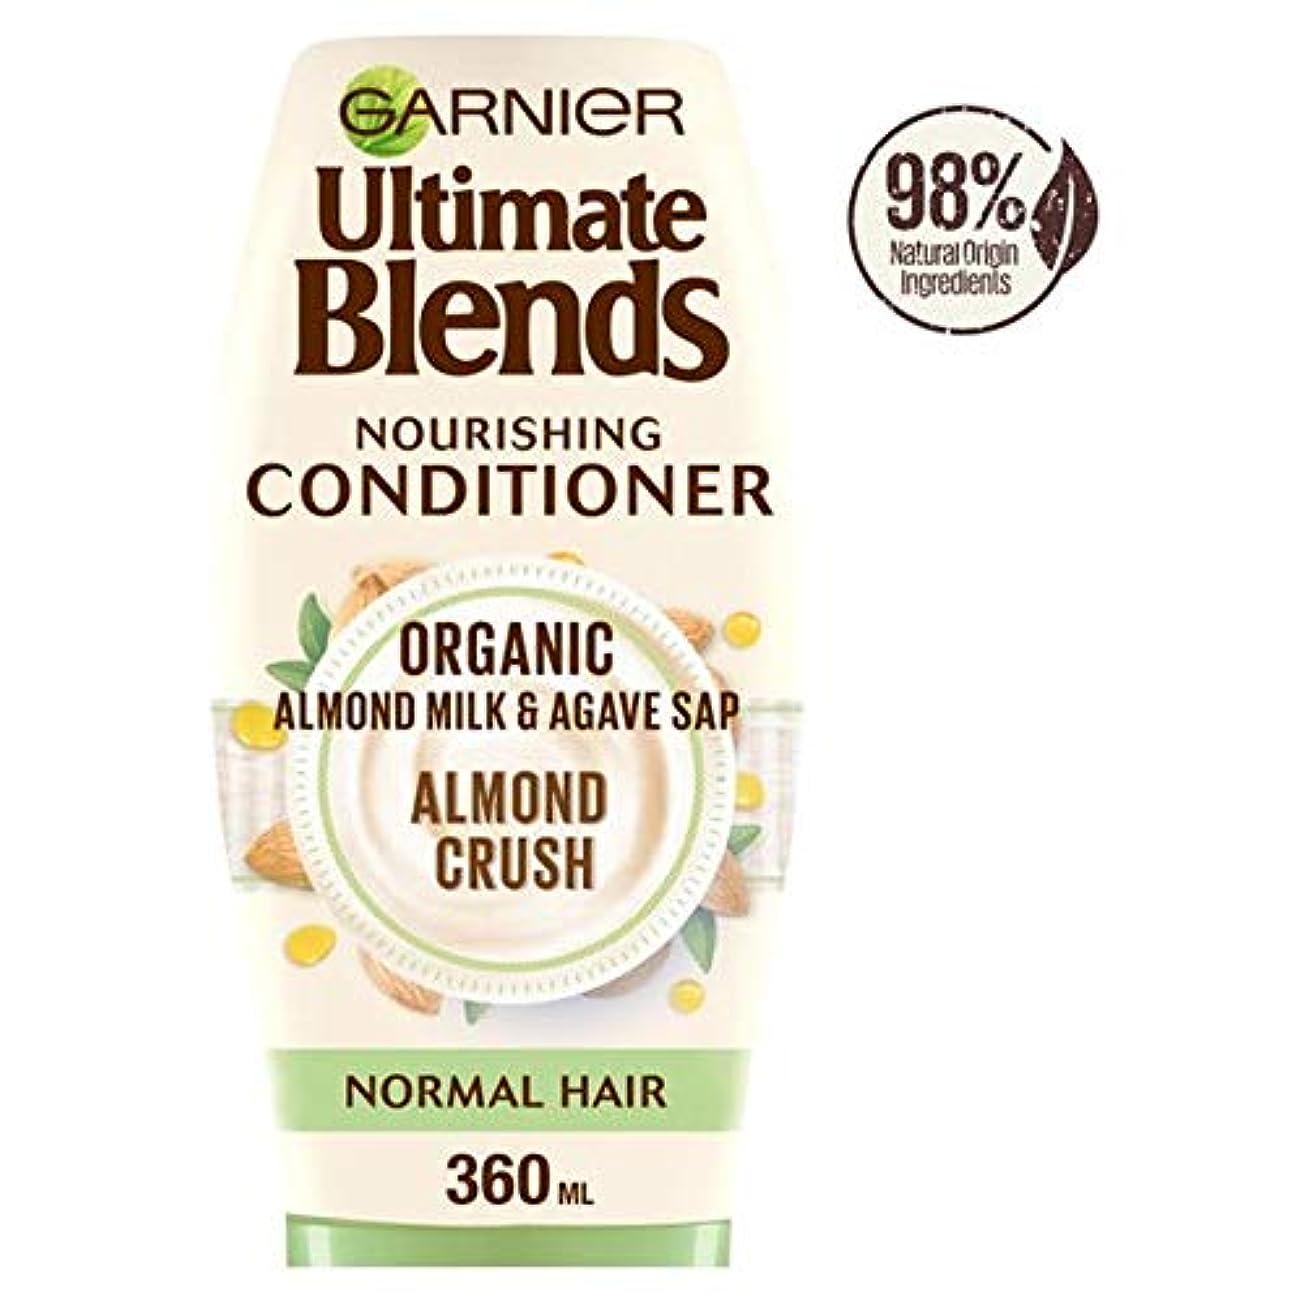 [Ultimate Blends ] ガルニエ究極は、アーモンドミルク、通常のヘアコンディショナー360ミリリットルをブレンド - Garnier Ultimate Blends Almond Milk Normal Hair...